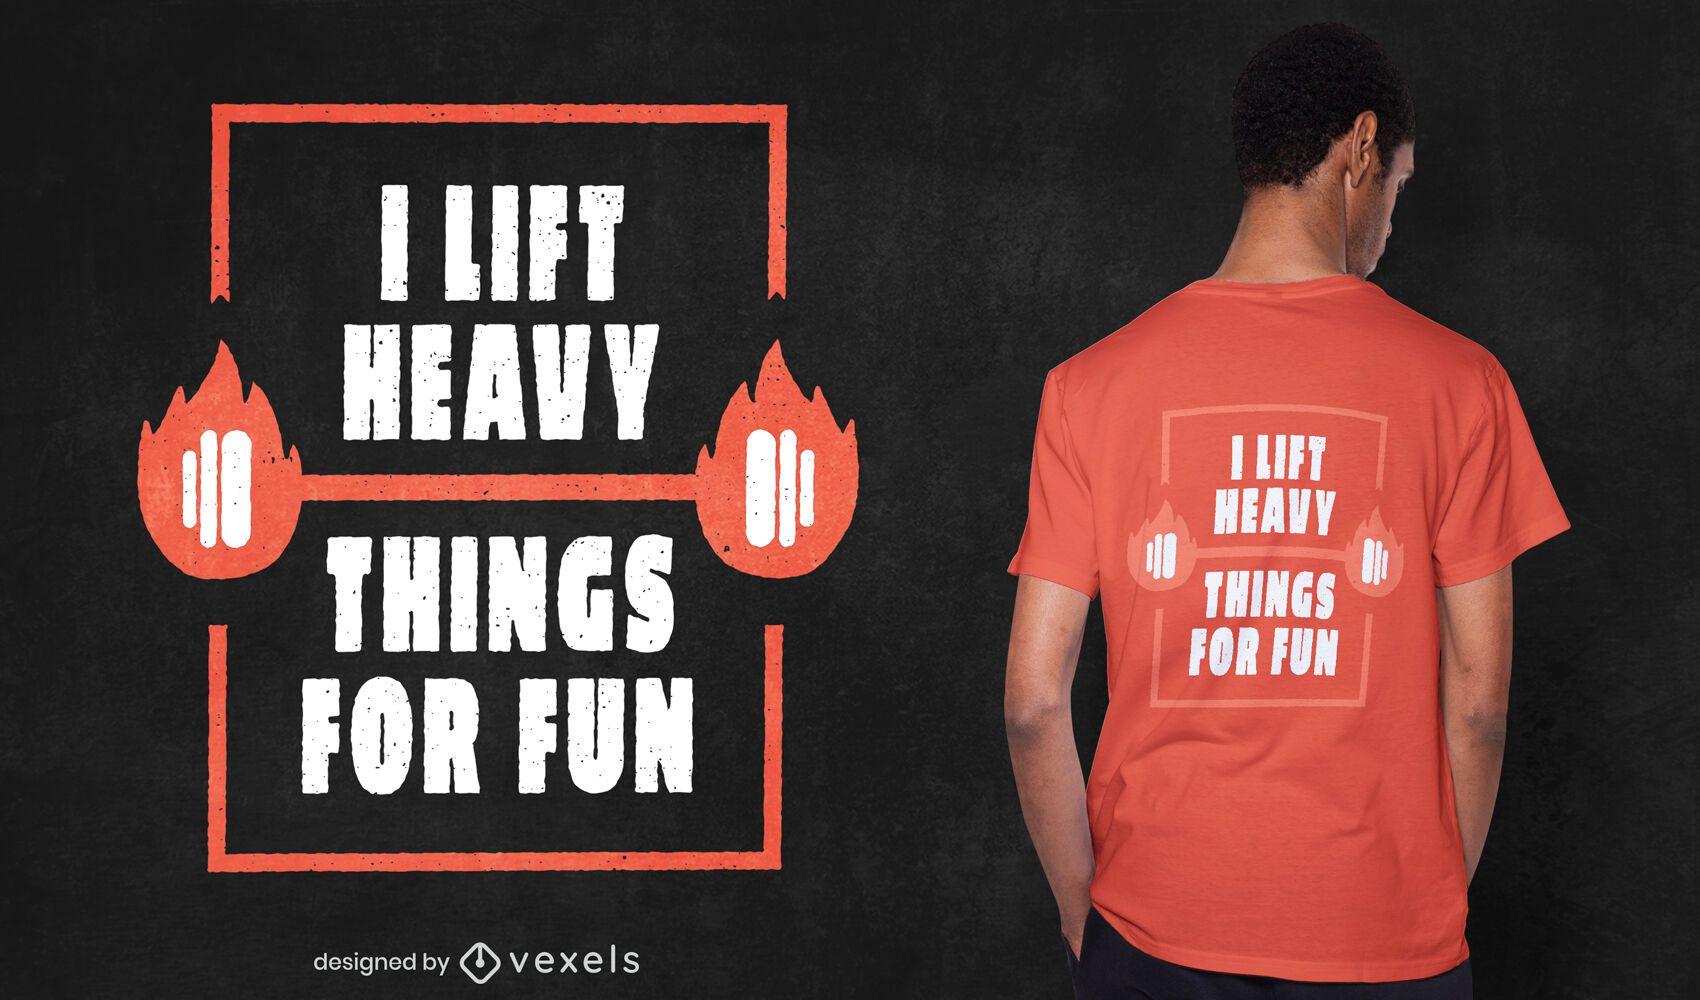 Divertido dise?o de camiseta de levantamiento de pesas.